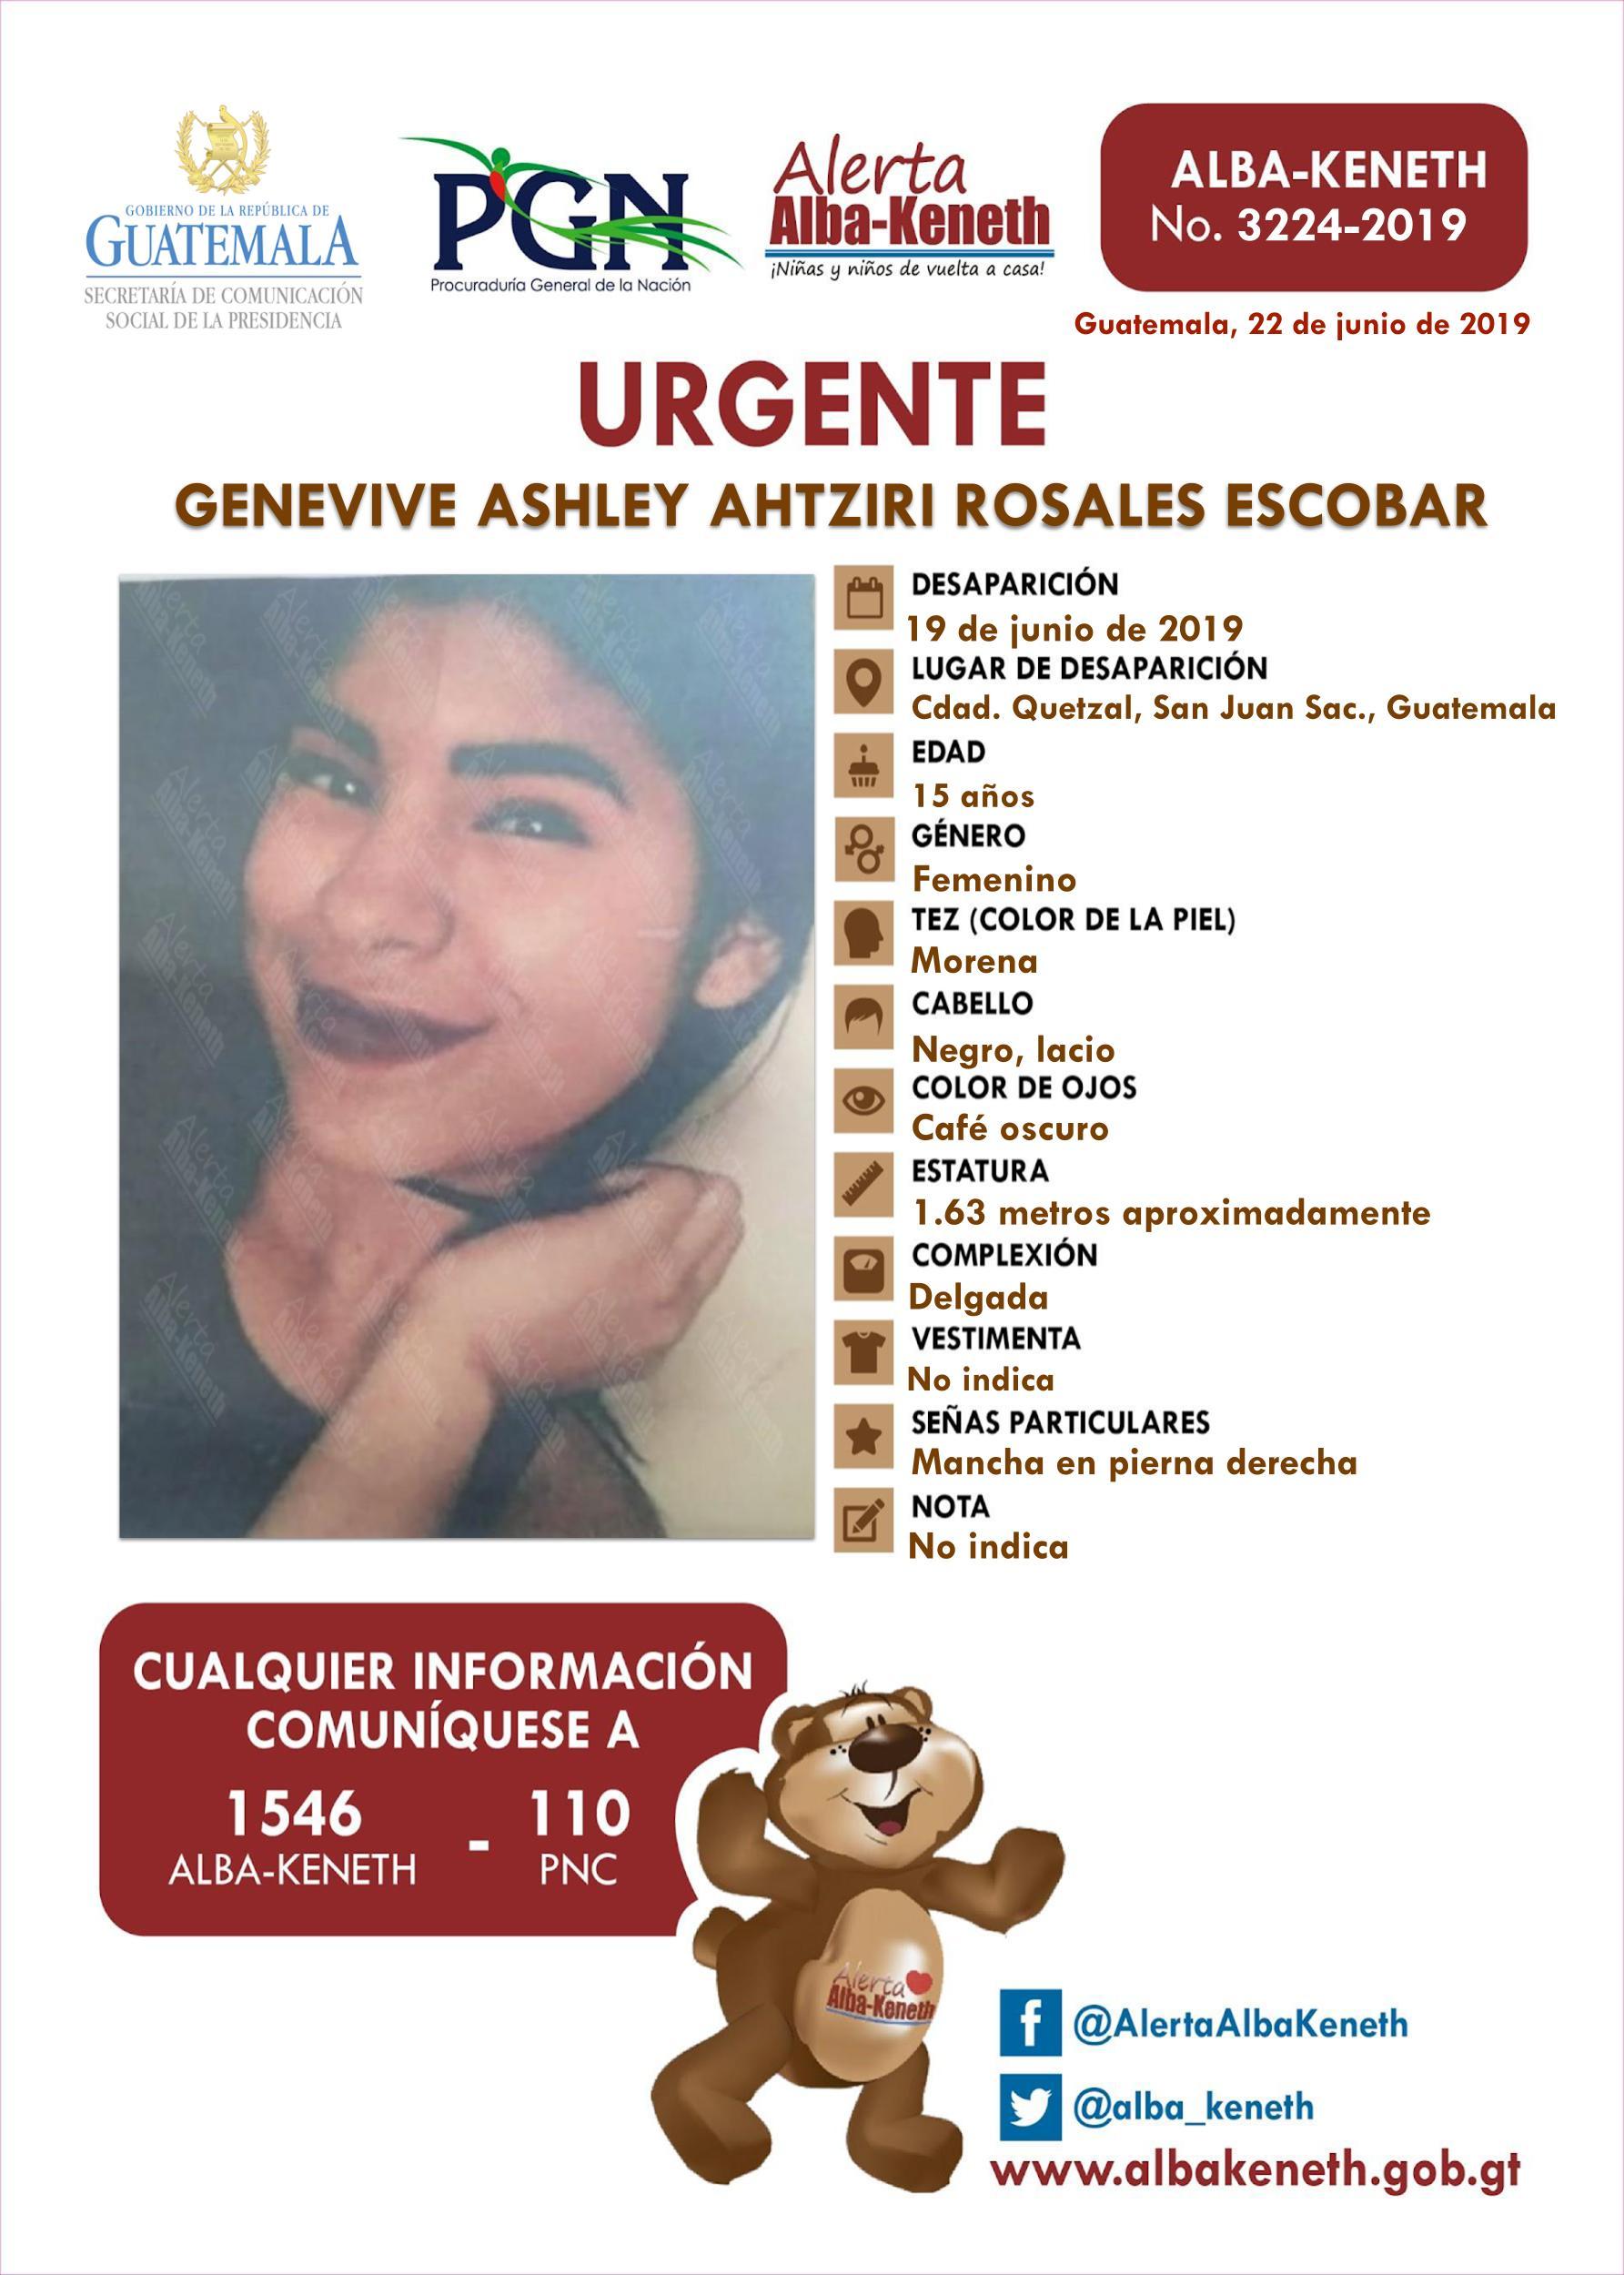 Genevive Ashley Ahtziri Rosales Escobar